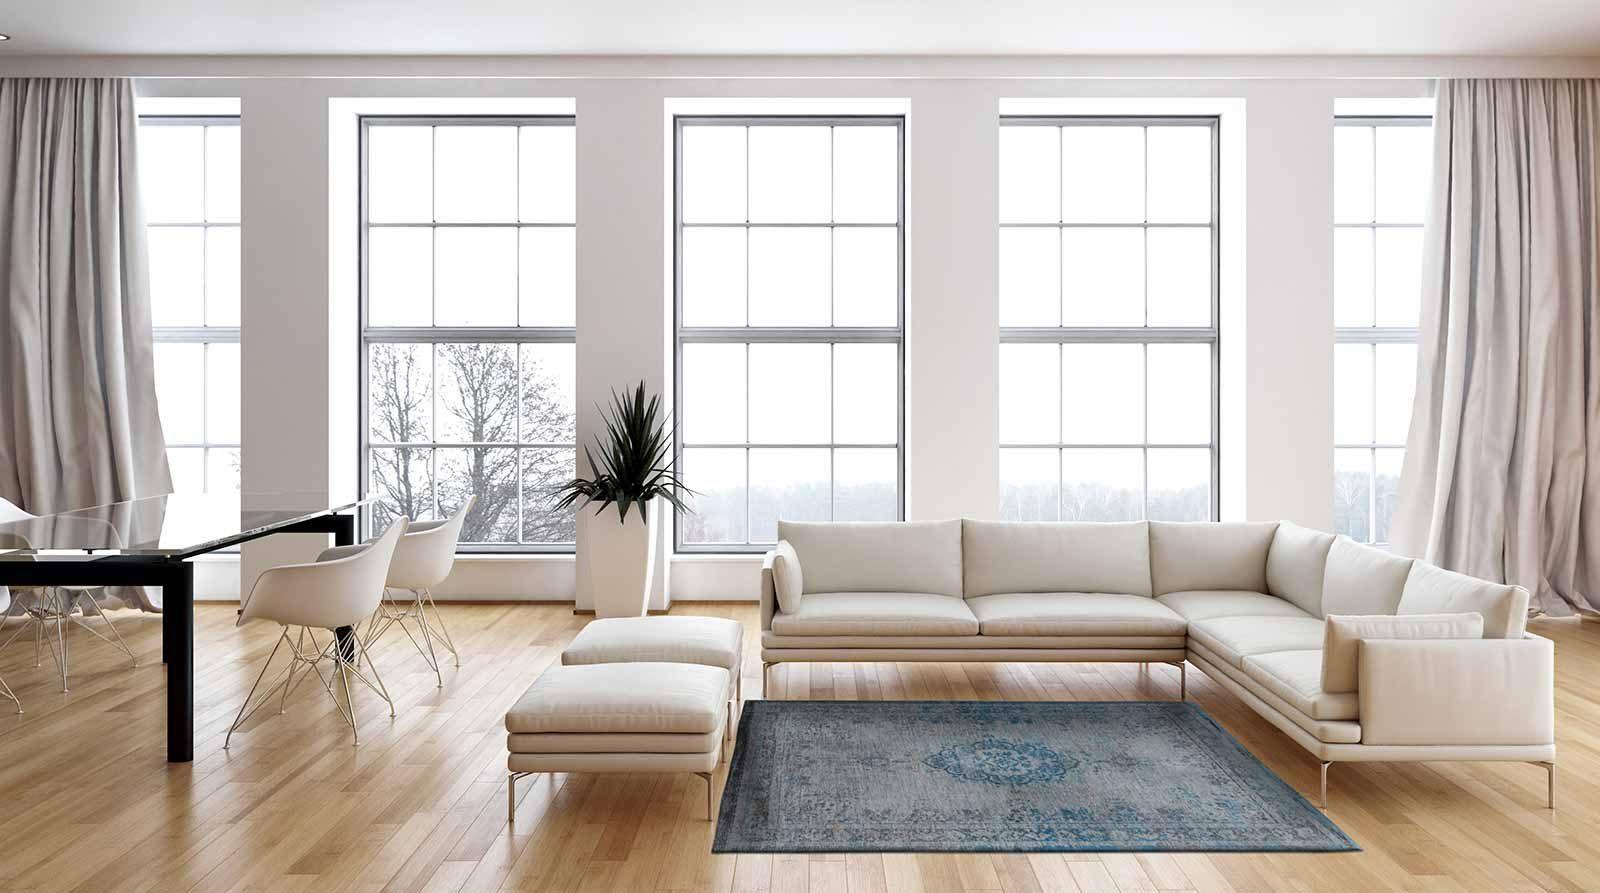 tapis Louis De Poortere LX8255 Fading World Medaillon Grey Turquoise interior